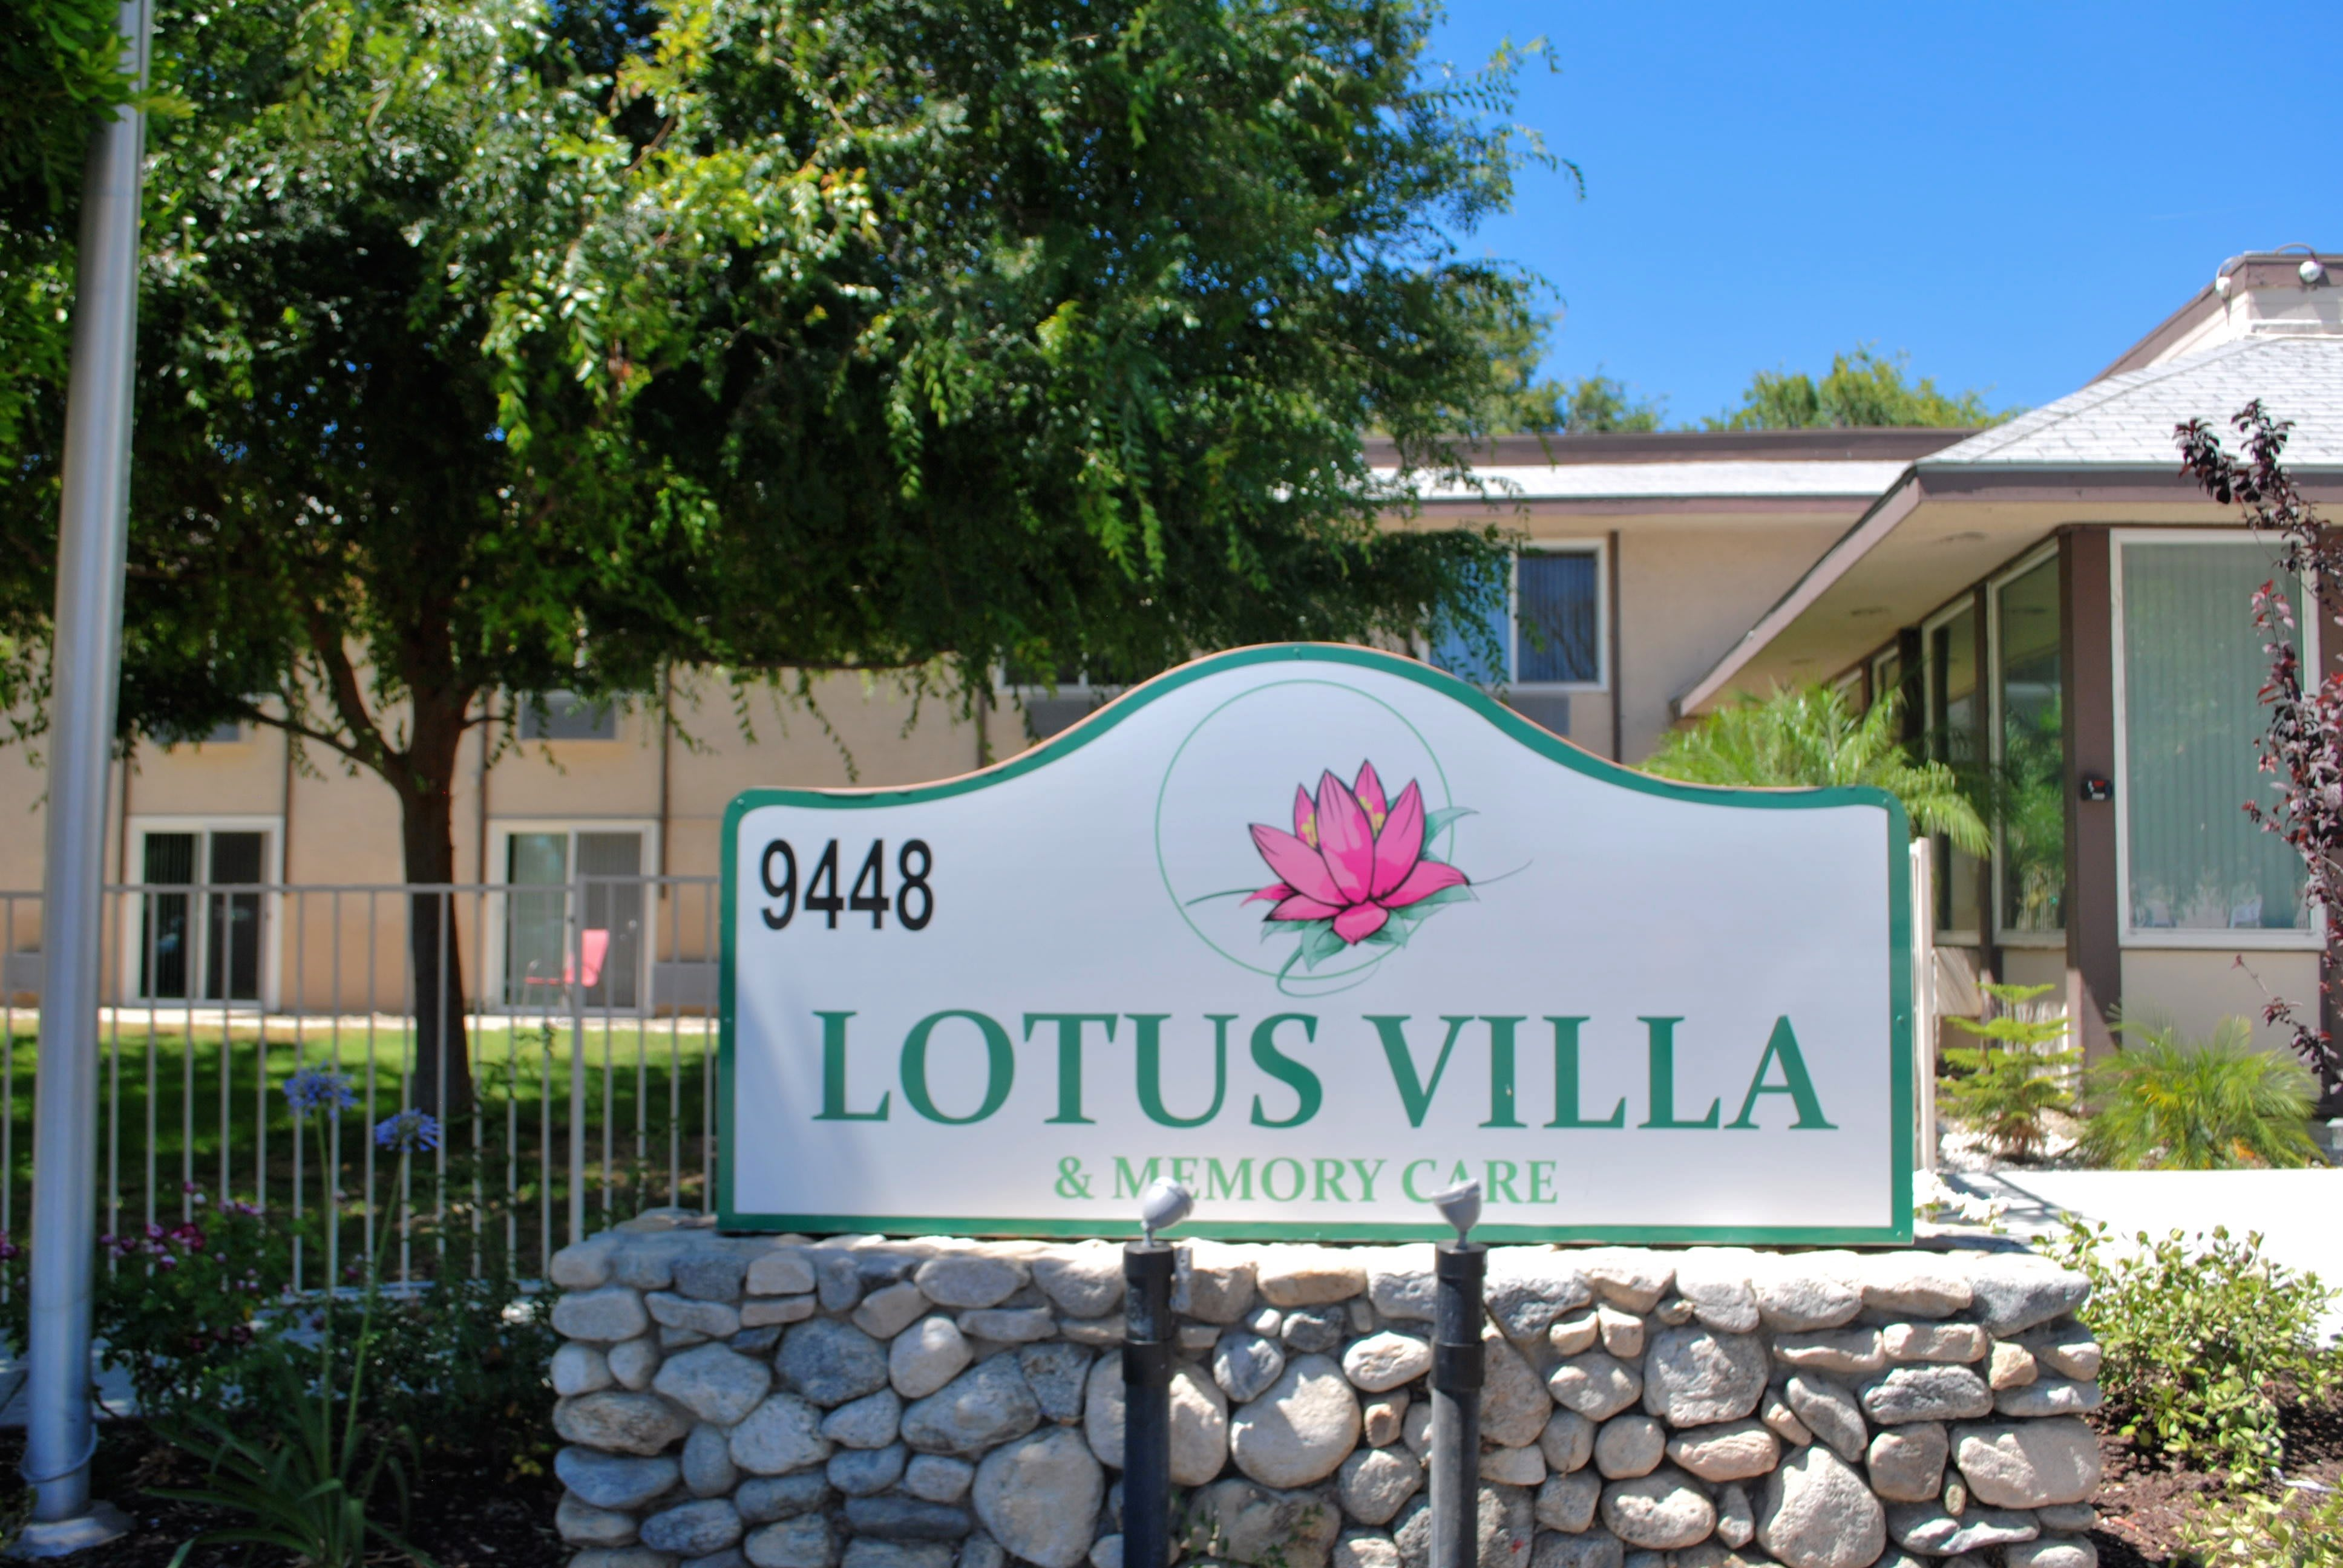 Photo 1 of Lotus Villa And Memory Care